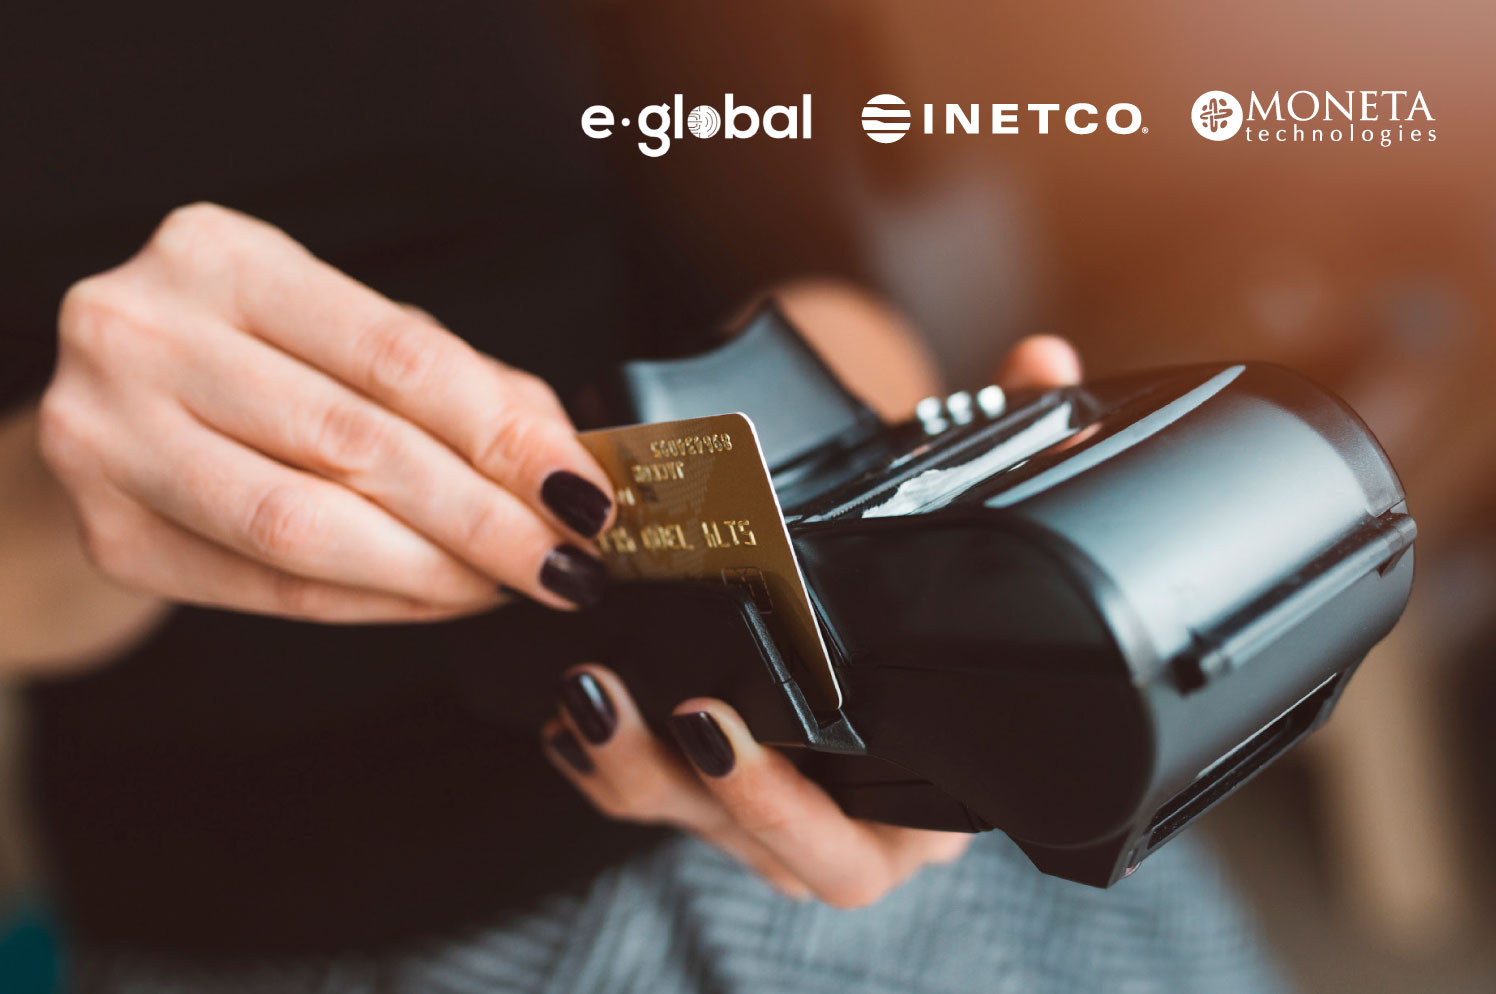 inetco-eglobal-webinar